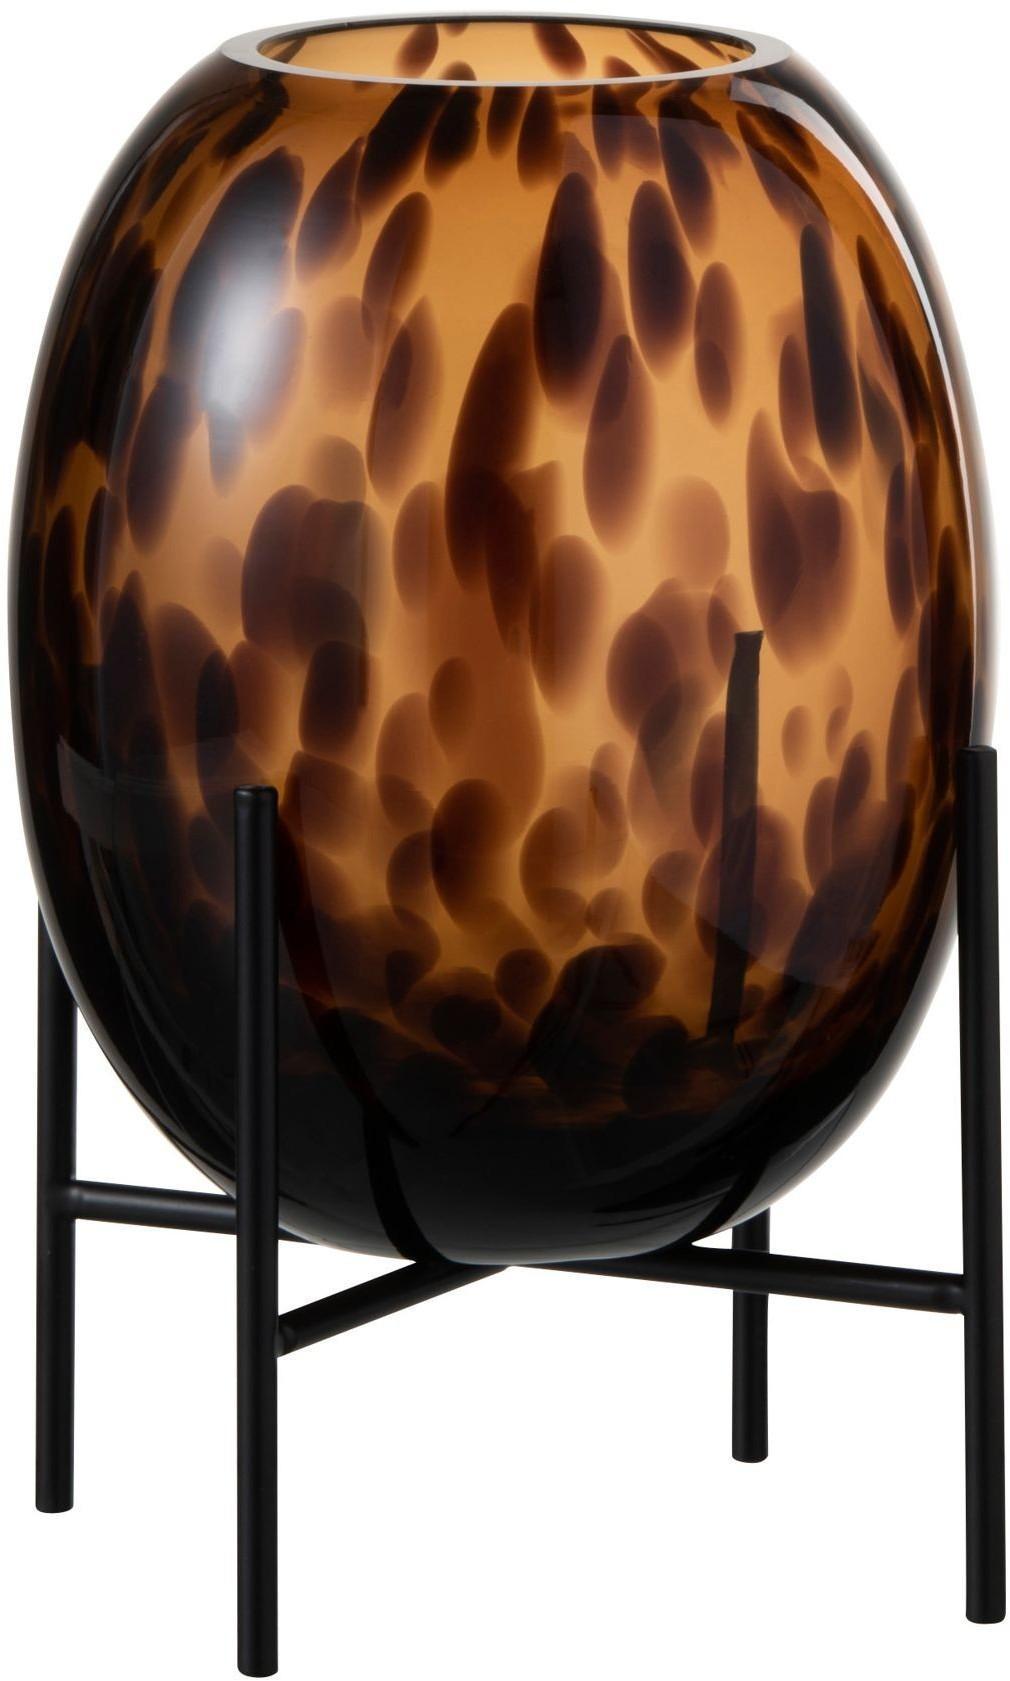 Sklenená hnedo - čierna dekoračné váza Speck na podstavci - Ø 23 * 12cm